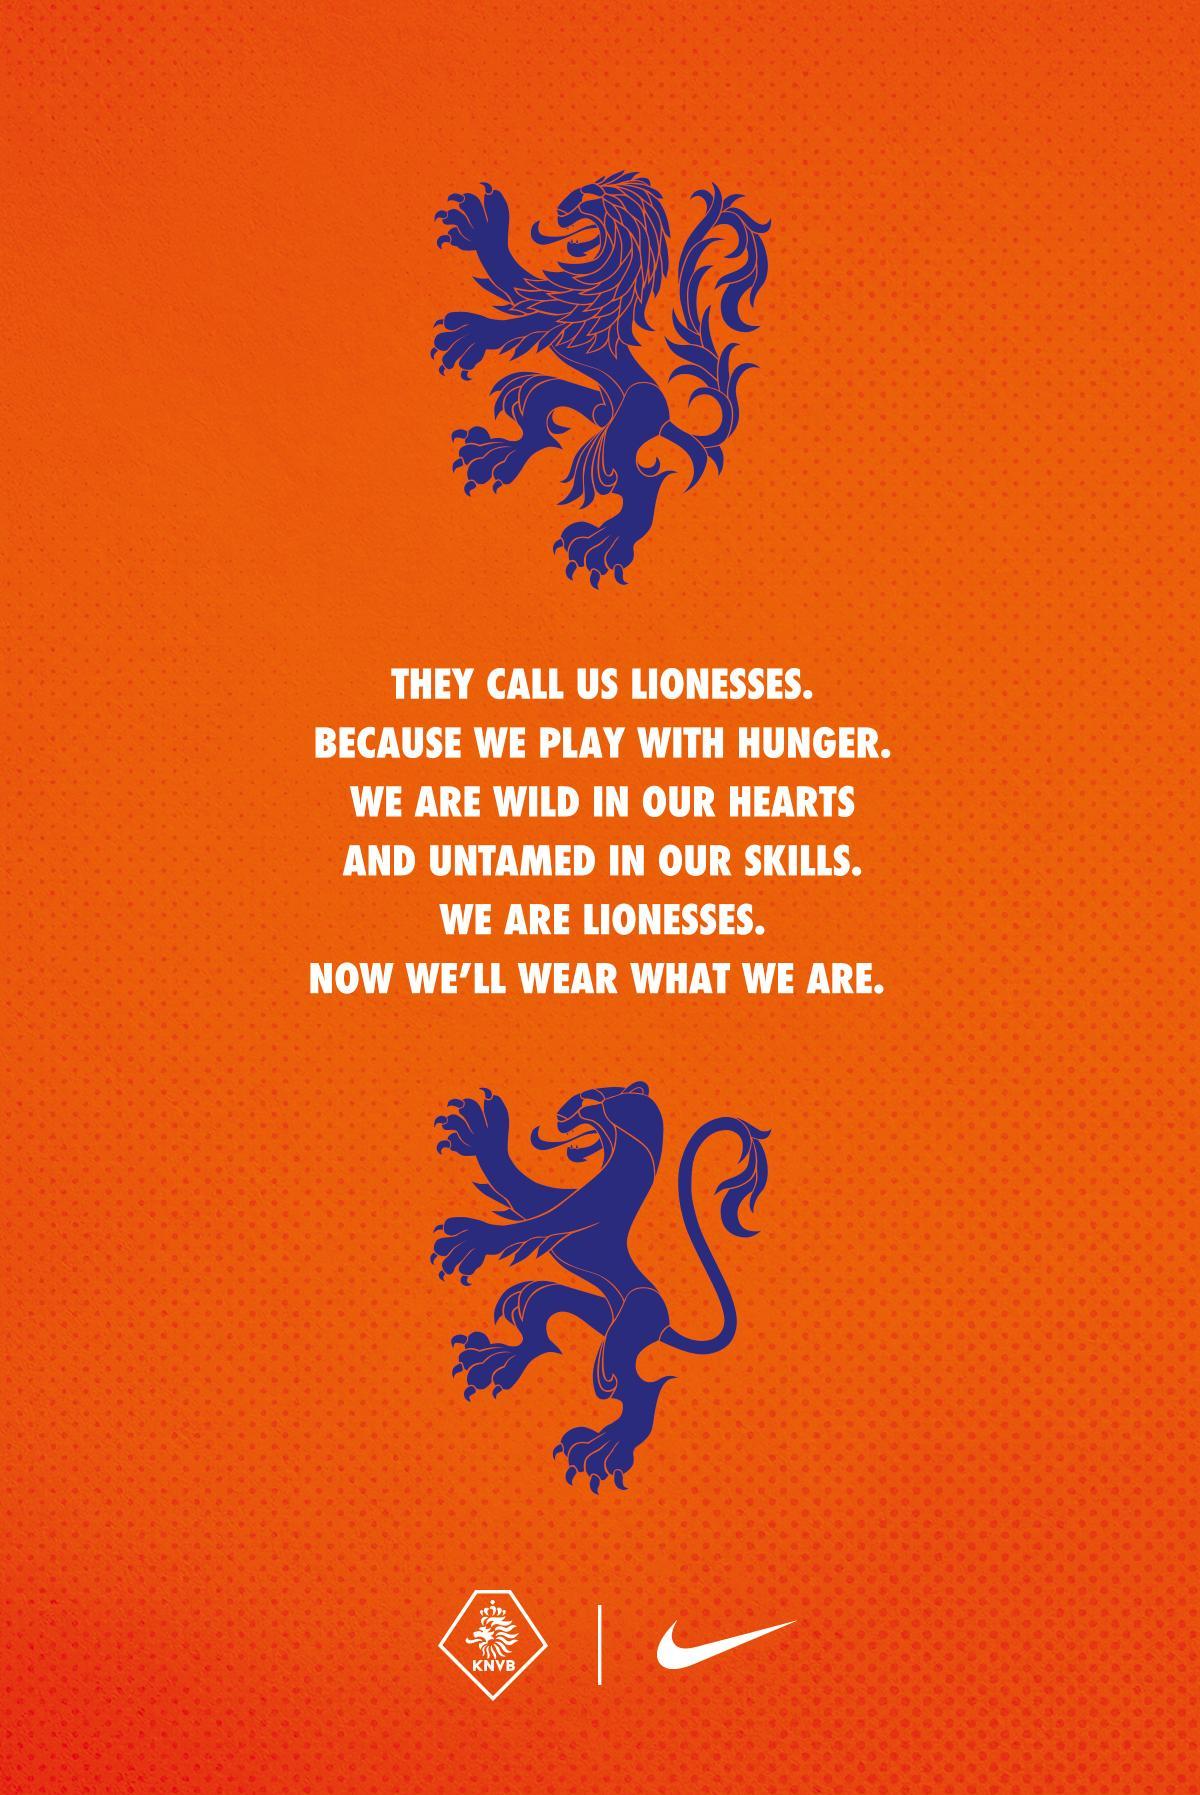 Nike Design Ad - They Call Us Leeuwinnen